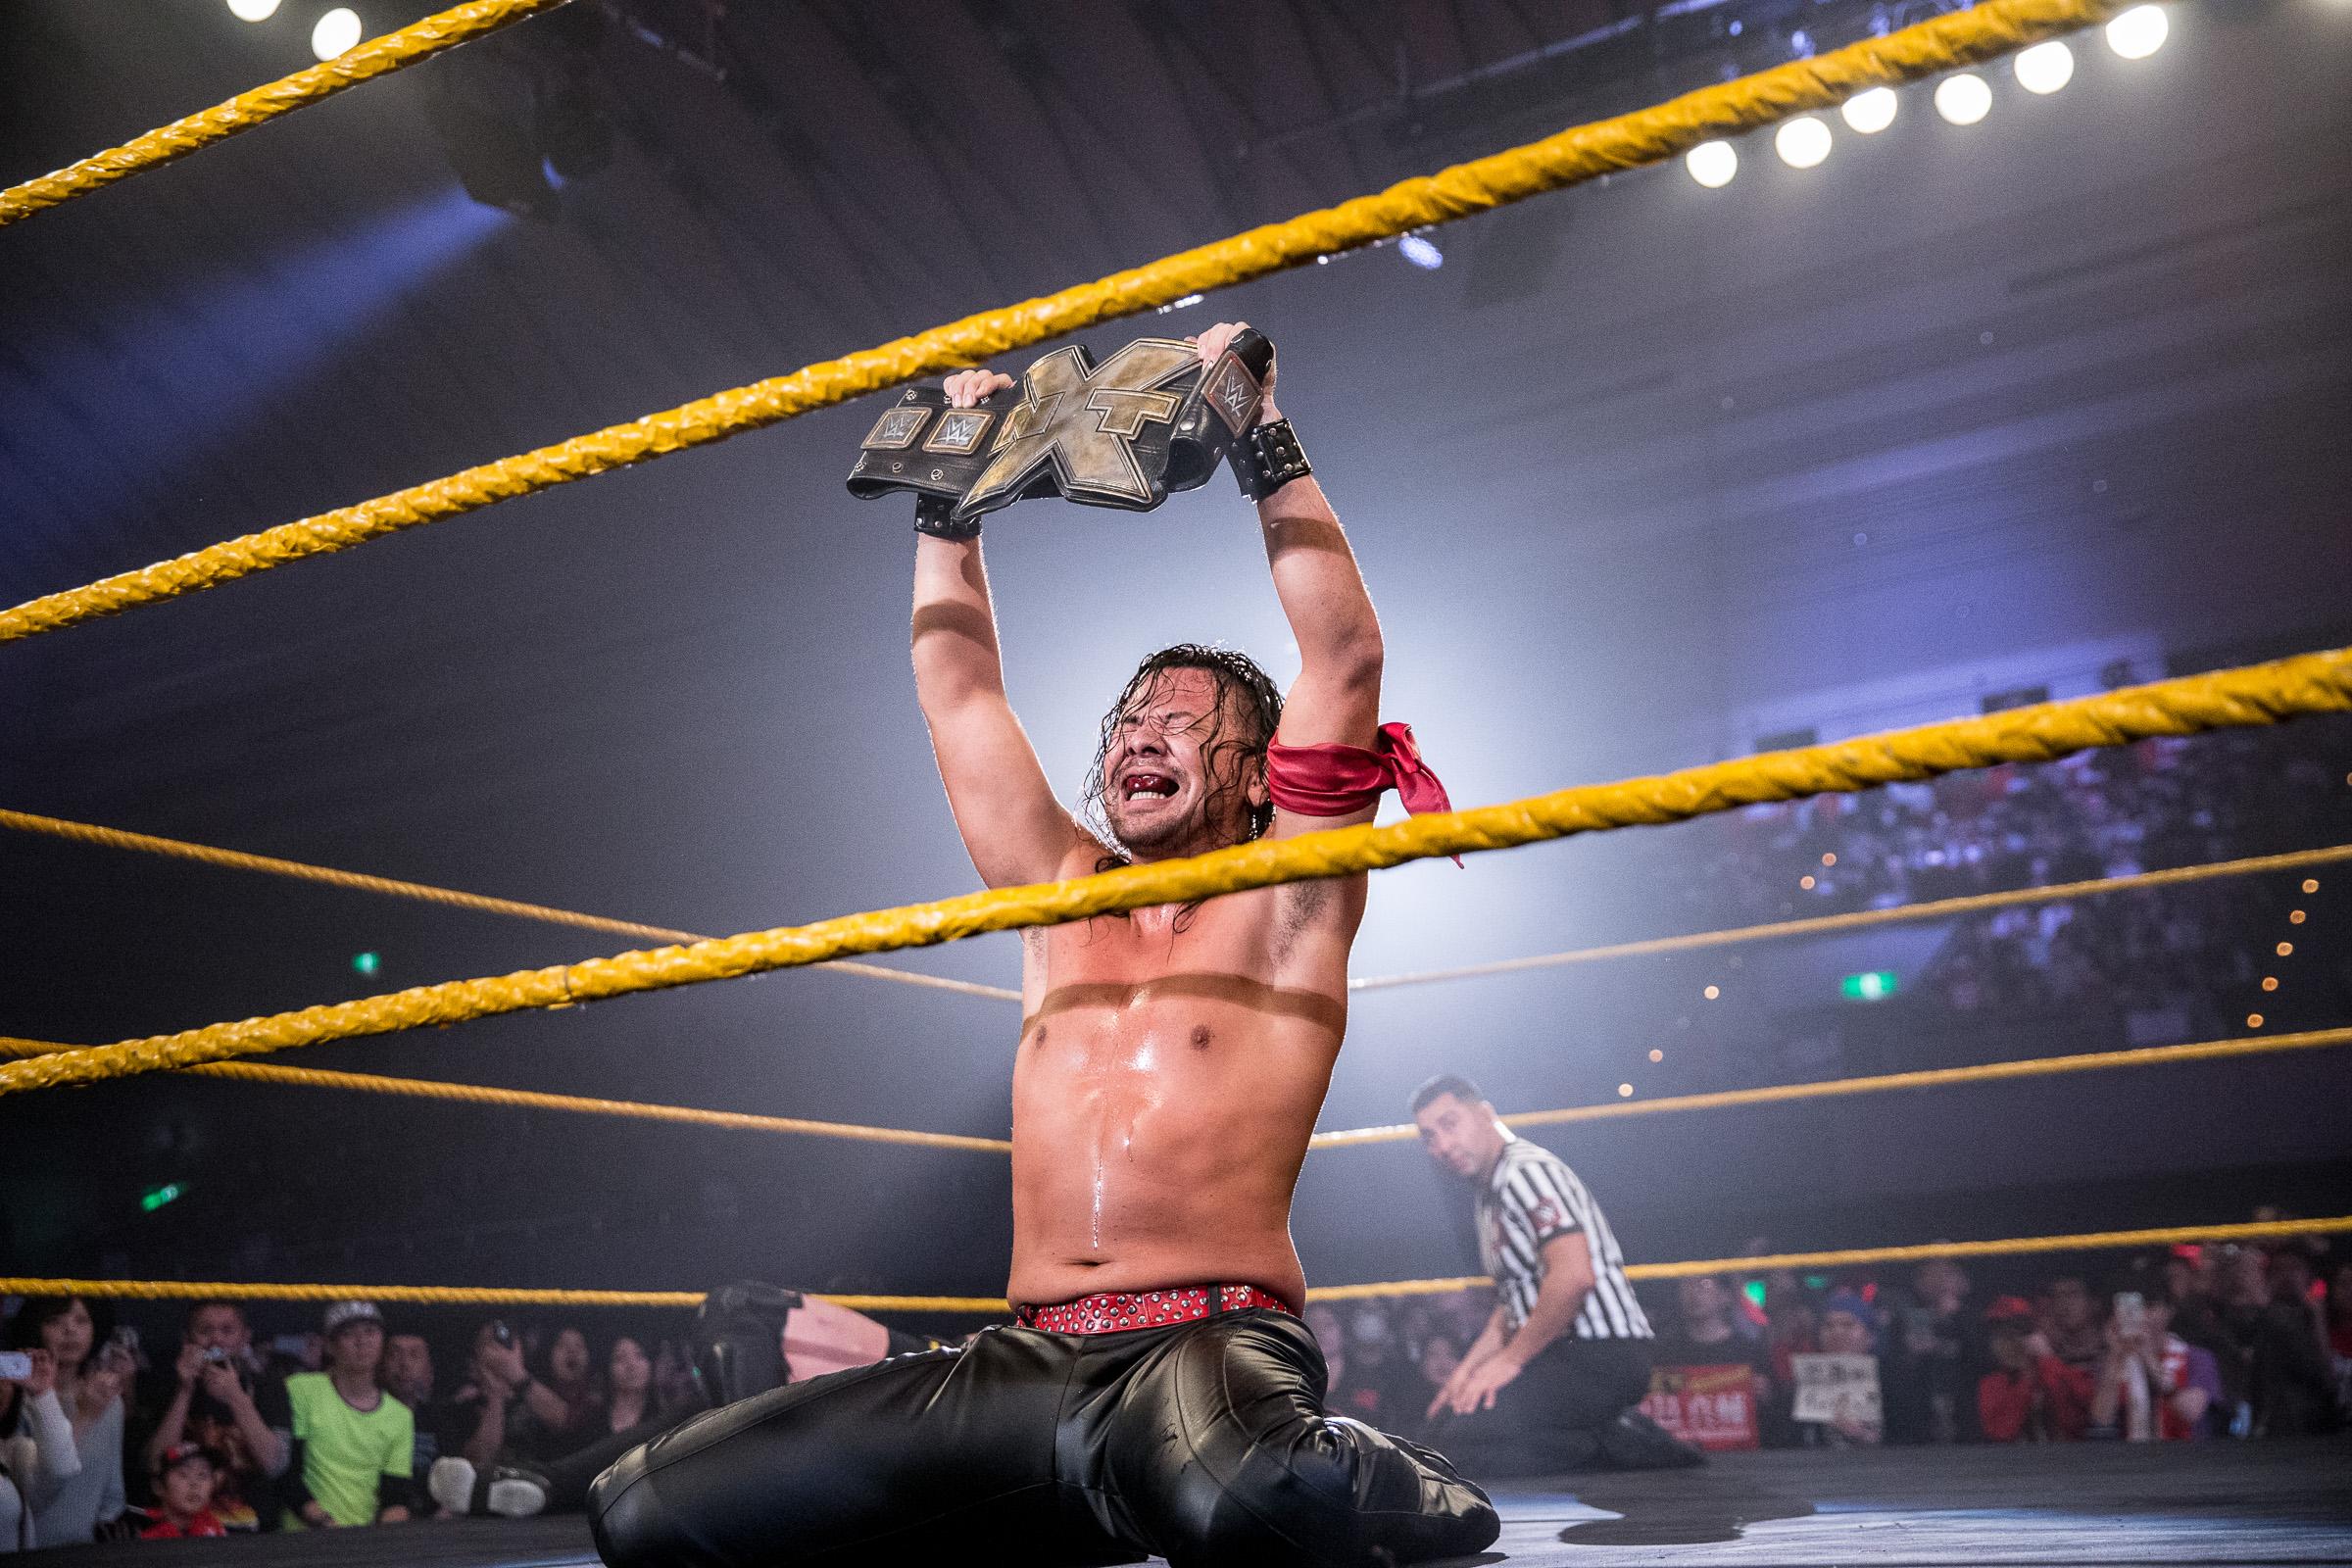 【WWE】日本人NXTスーパースターたちが躍動!! 日本初上陸のNXT日本公演「NXT Live Japan」  イベントレポート